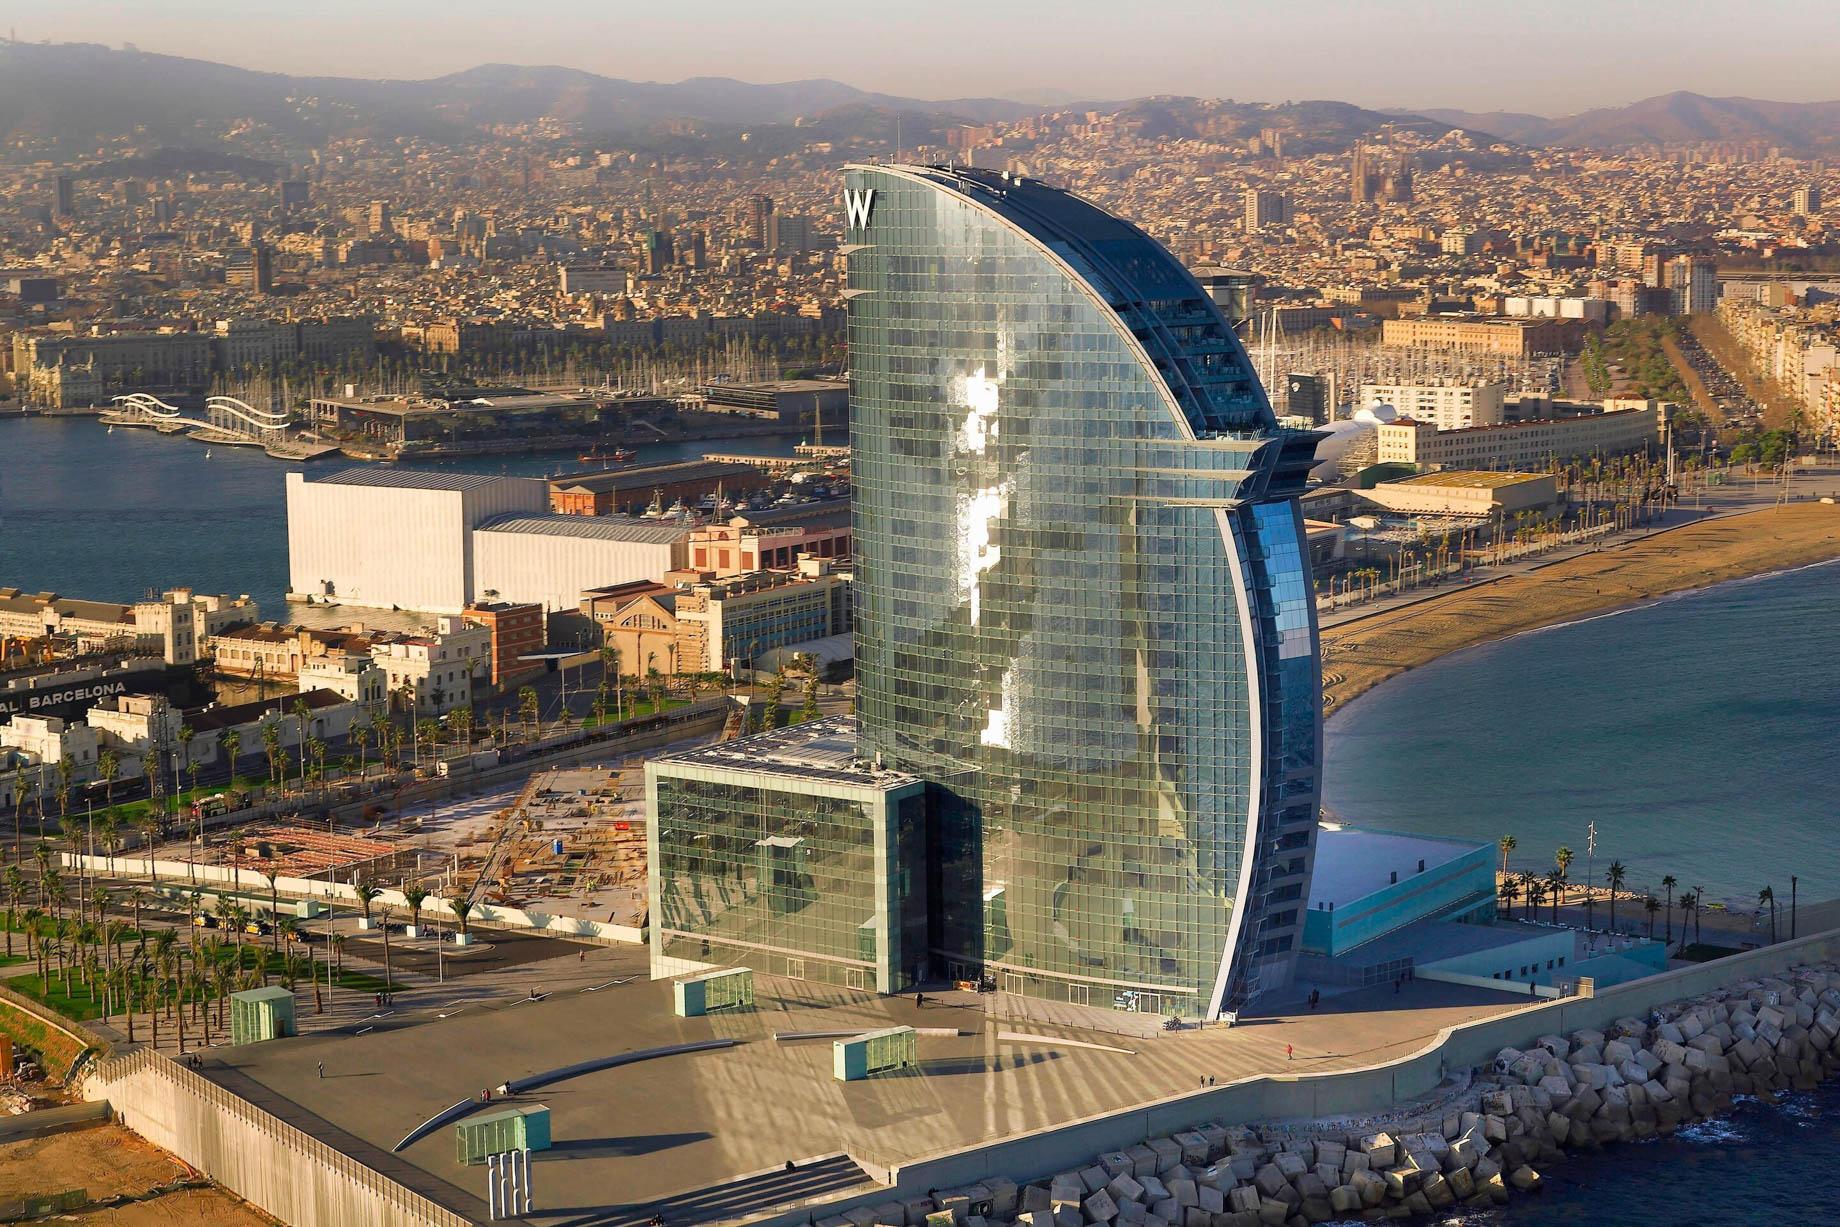 W Barcelona Luxury Hotel - Barcelona, Spain - Hotel City View Aerial